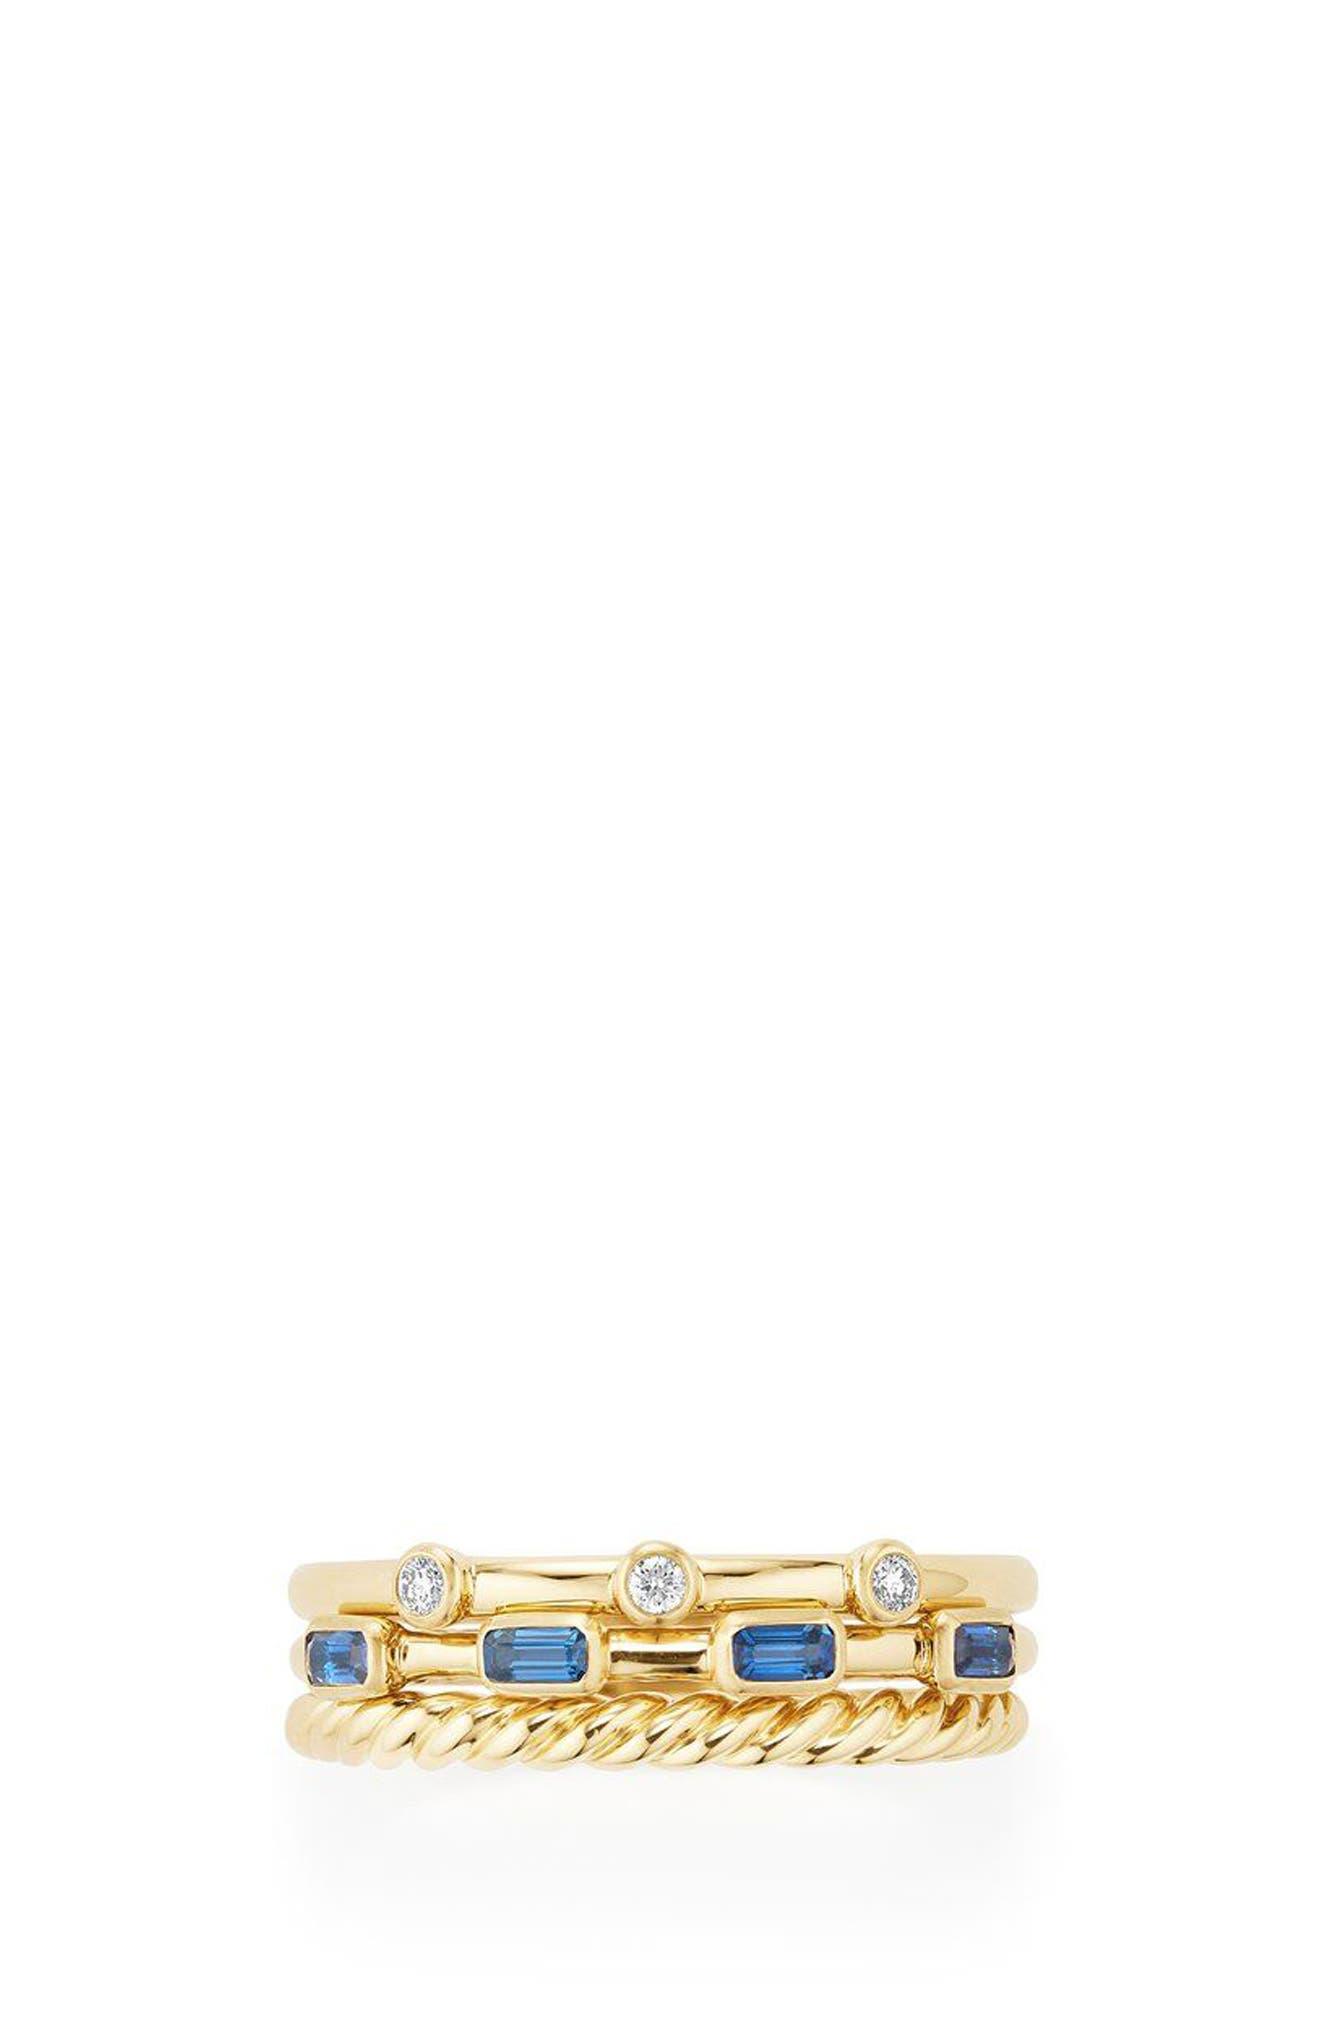 Novella 3-Row Ring with Diamonds,                             Alternate thumbnail 3, color,                             Gold/ Diamond/ Blue Sapphire